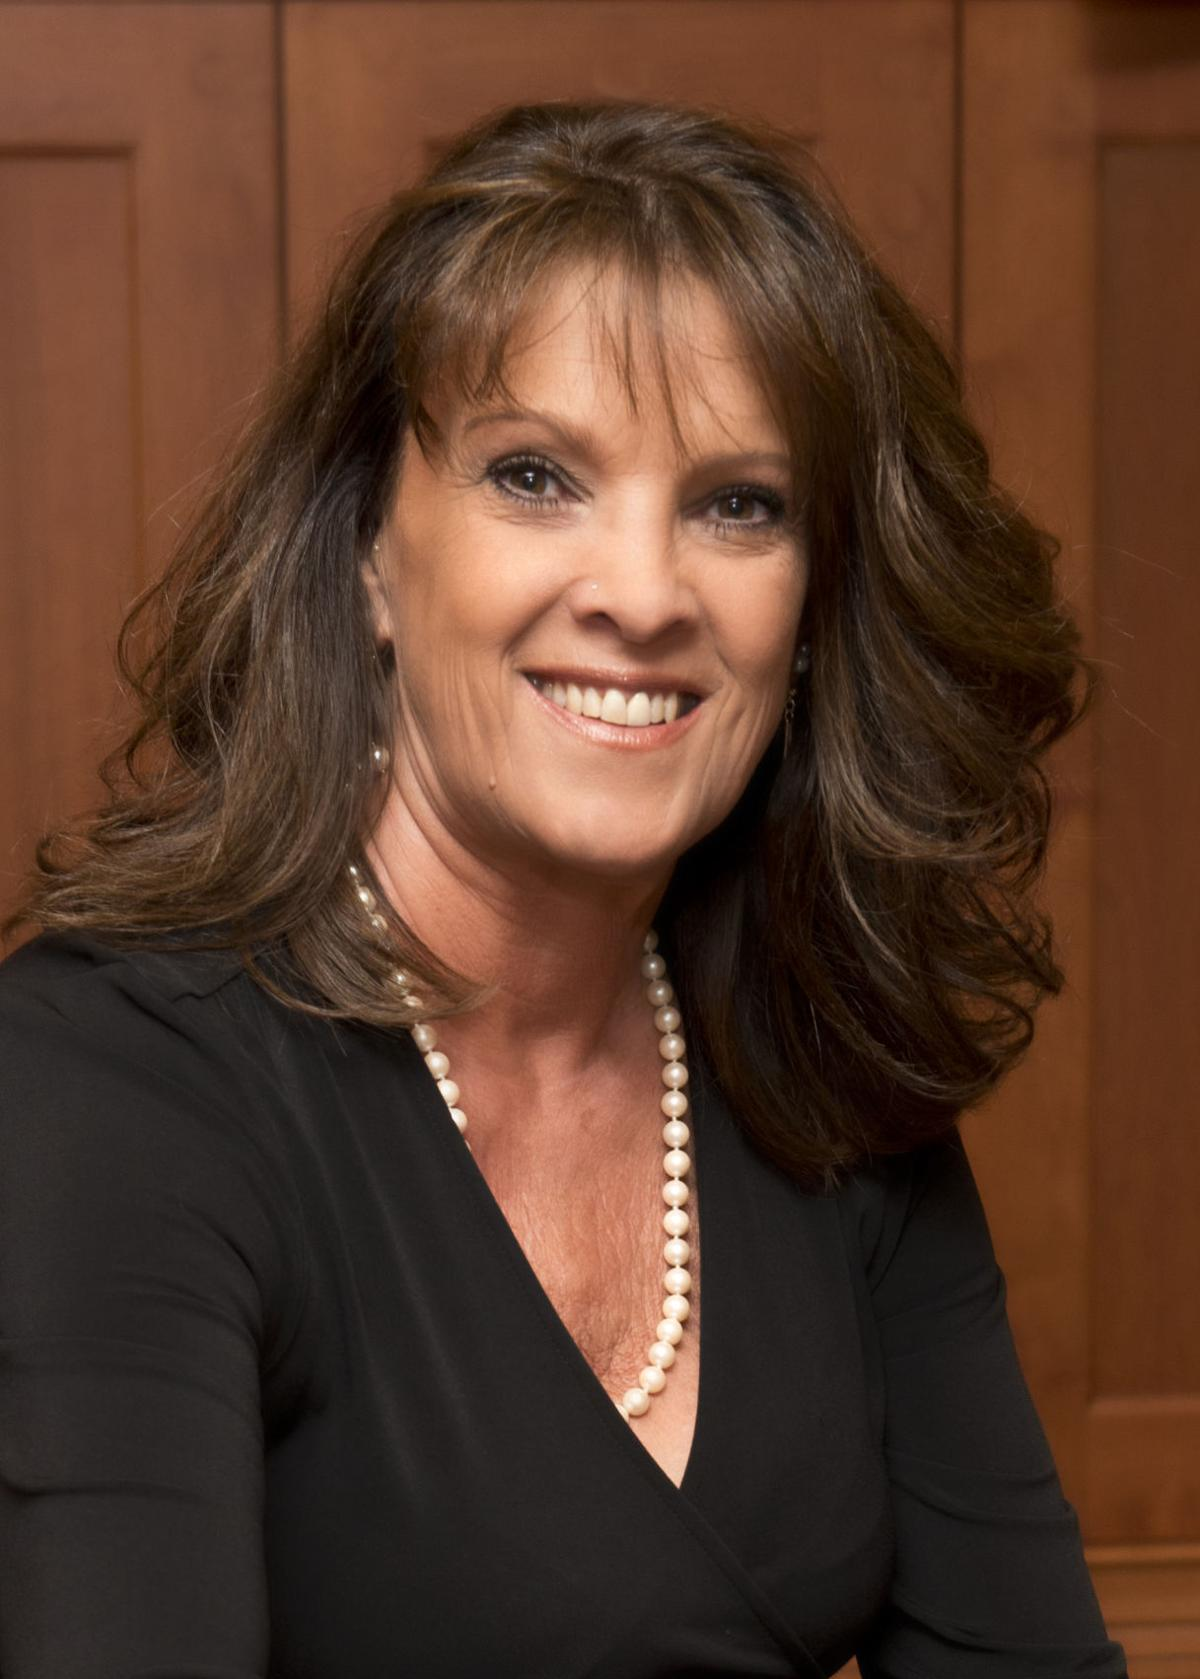 Susan K. Howell